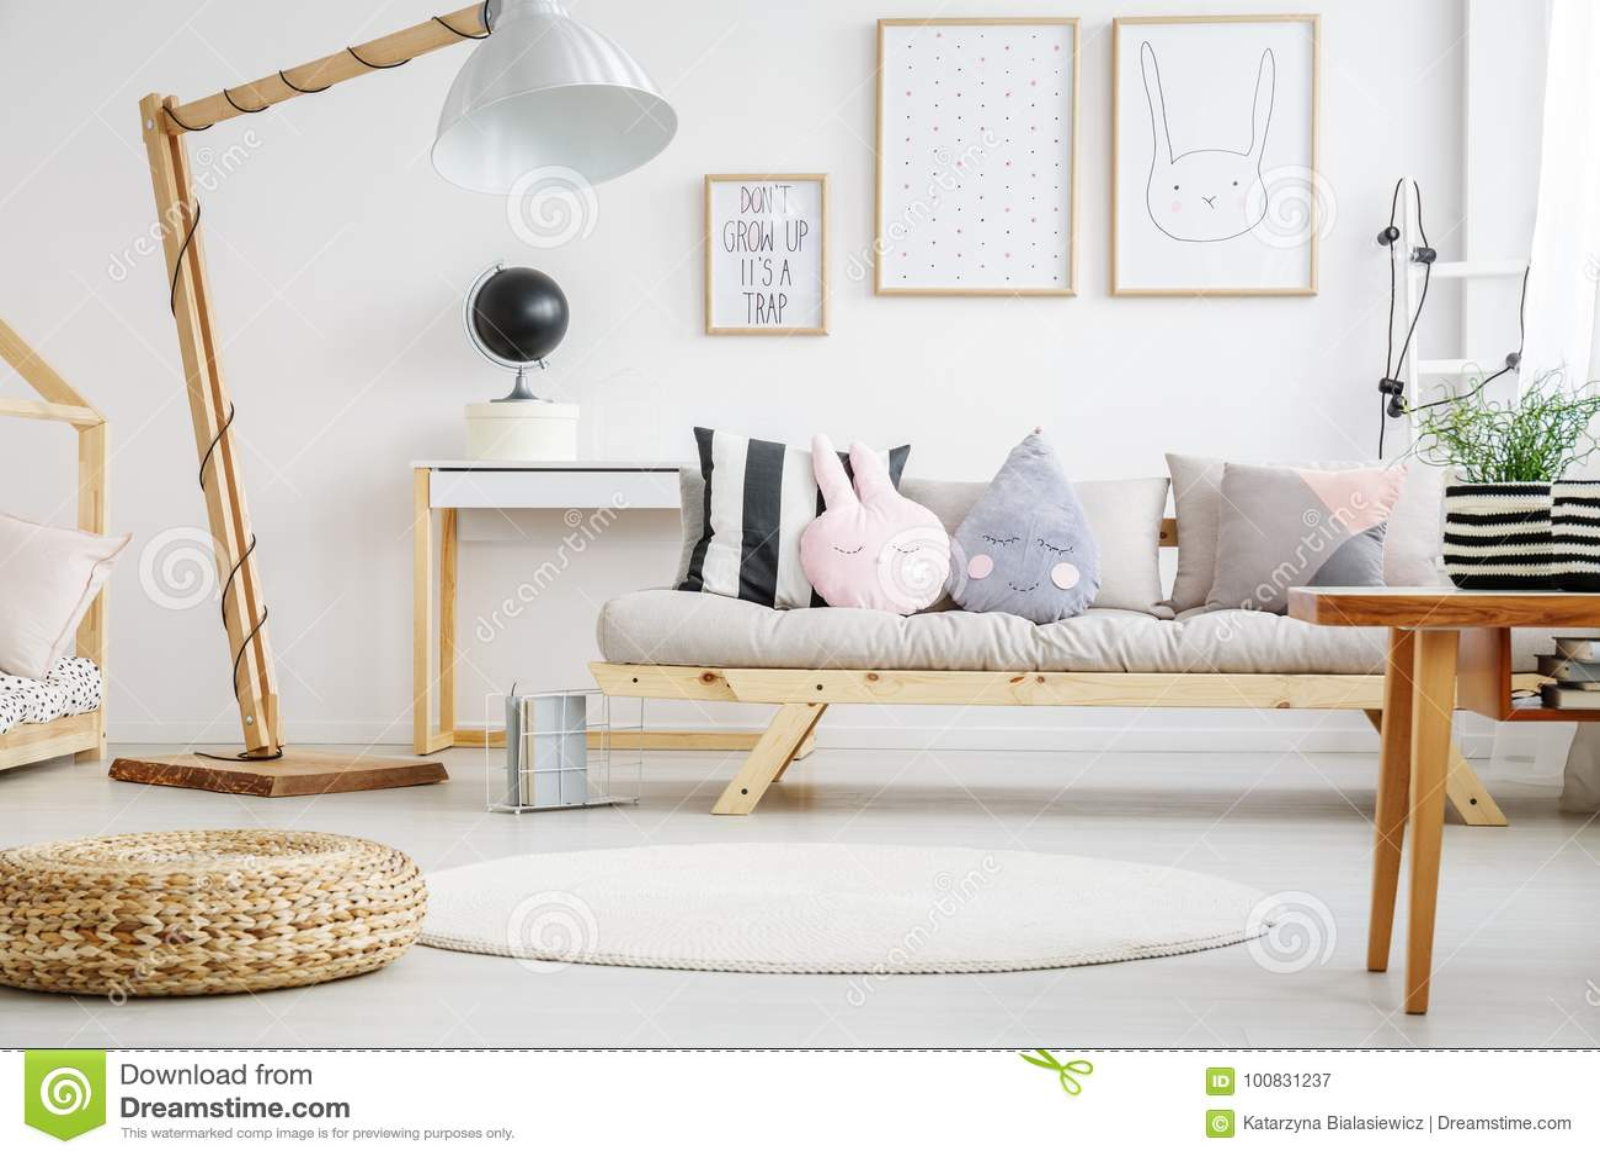 Designed Lamp Near Beige Sofa